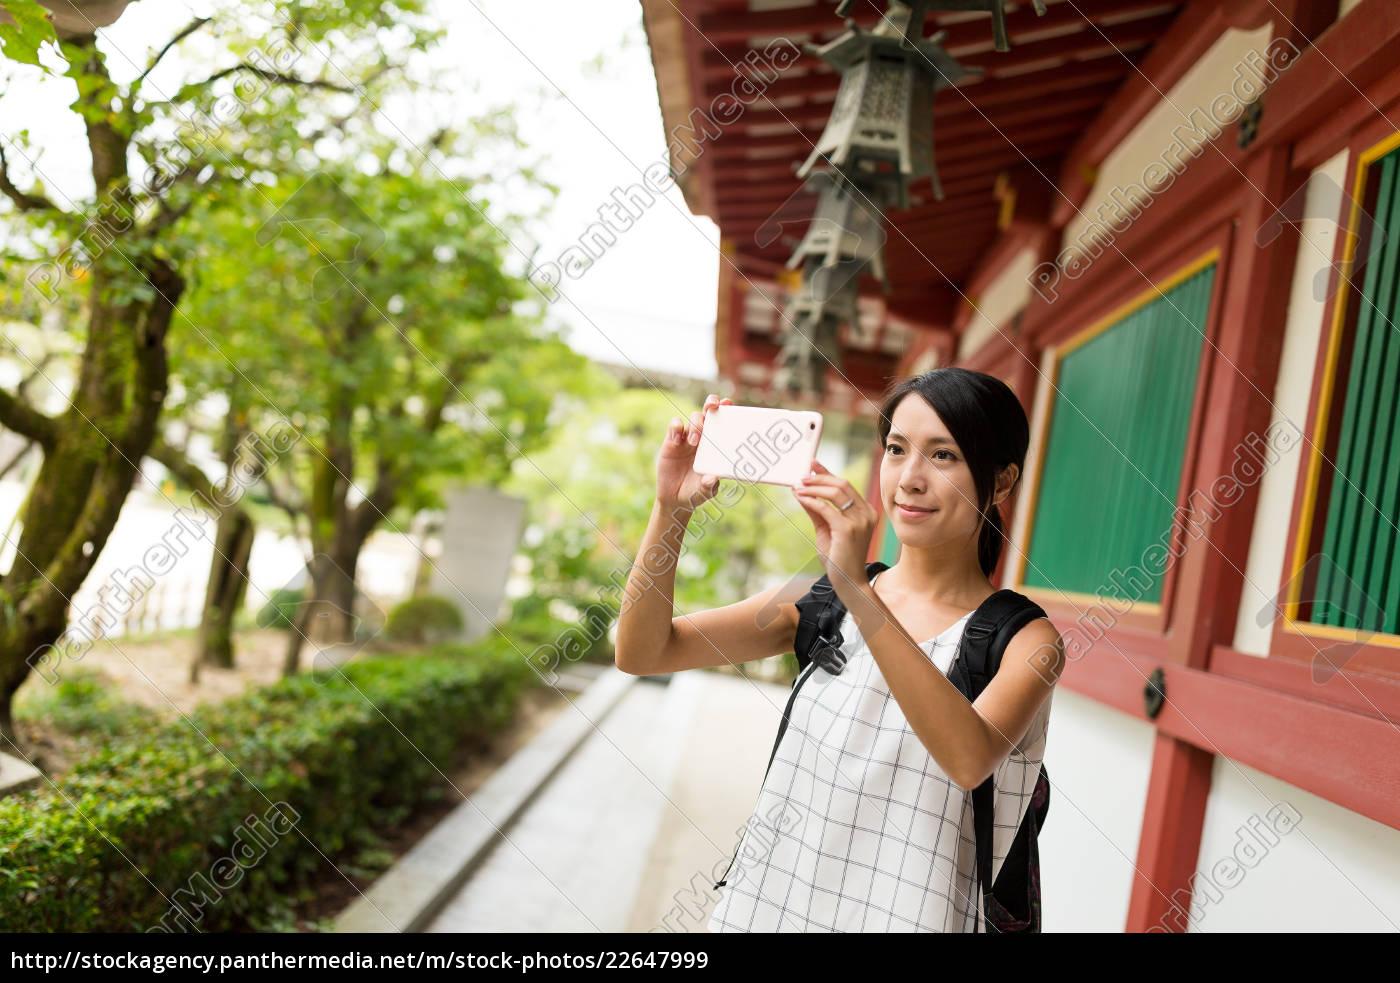 woman, taking, photo, in, dazaifu, tenmangu - 22647999